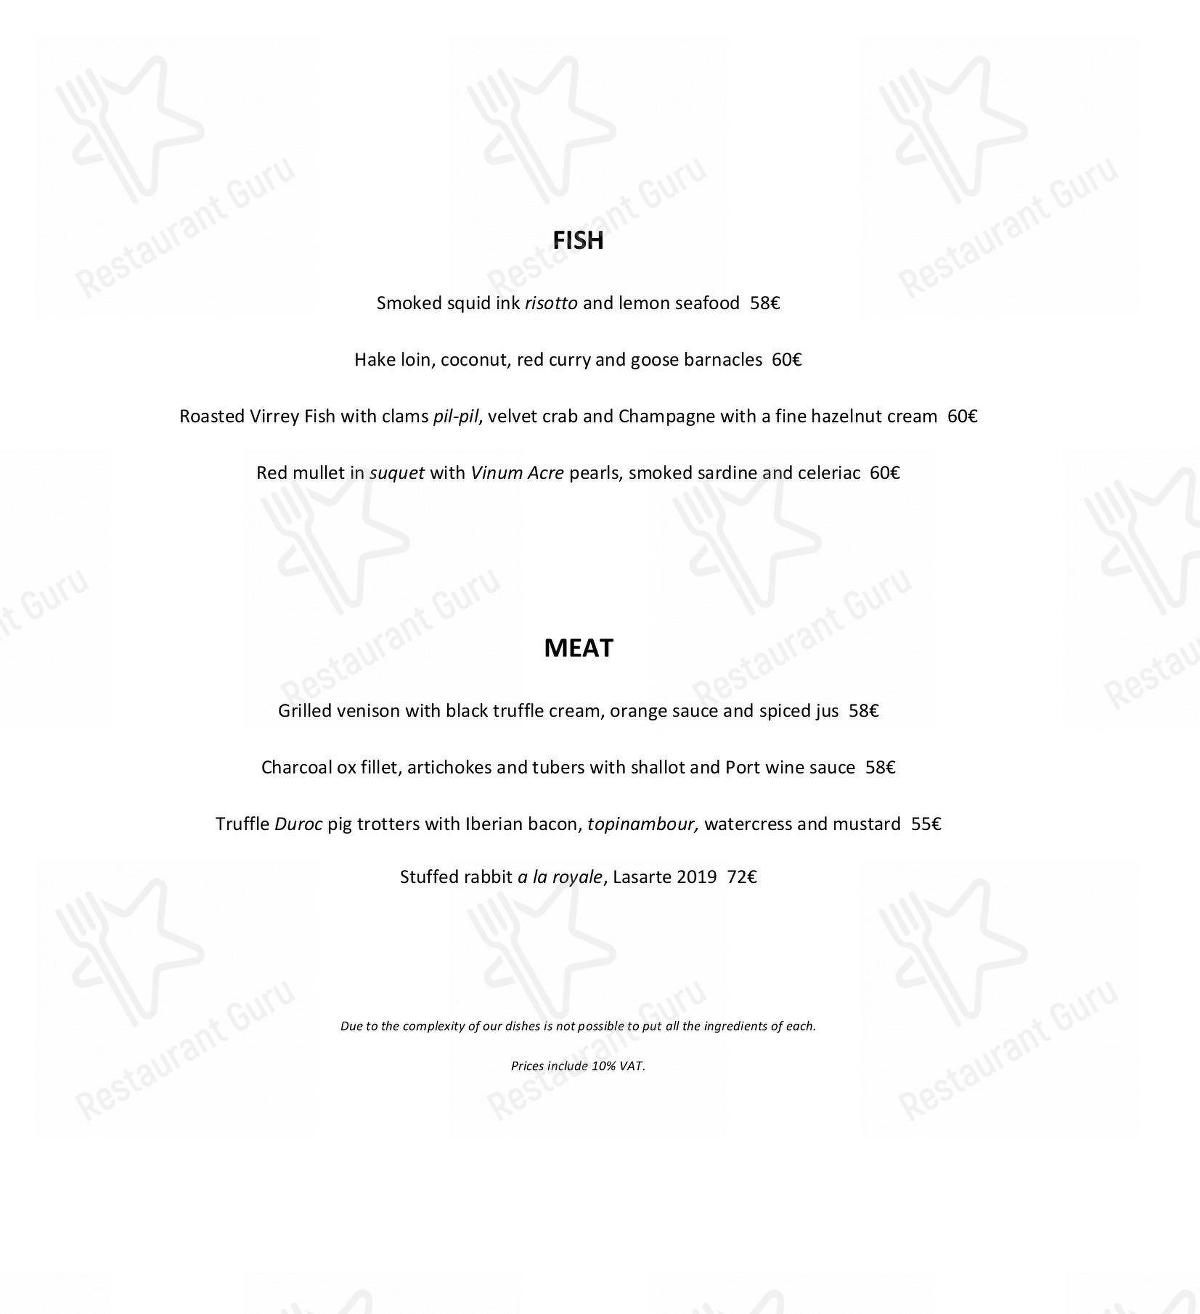 Lasarte menu - dishes and beverages